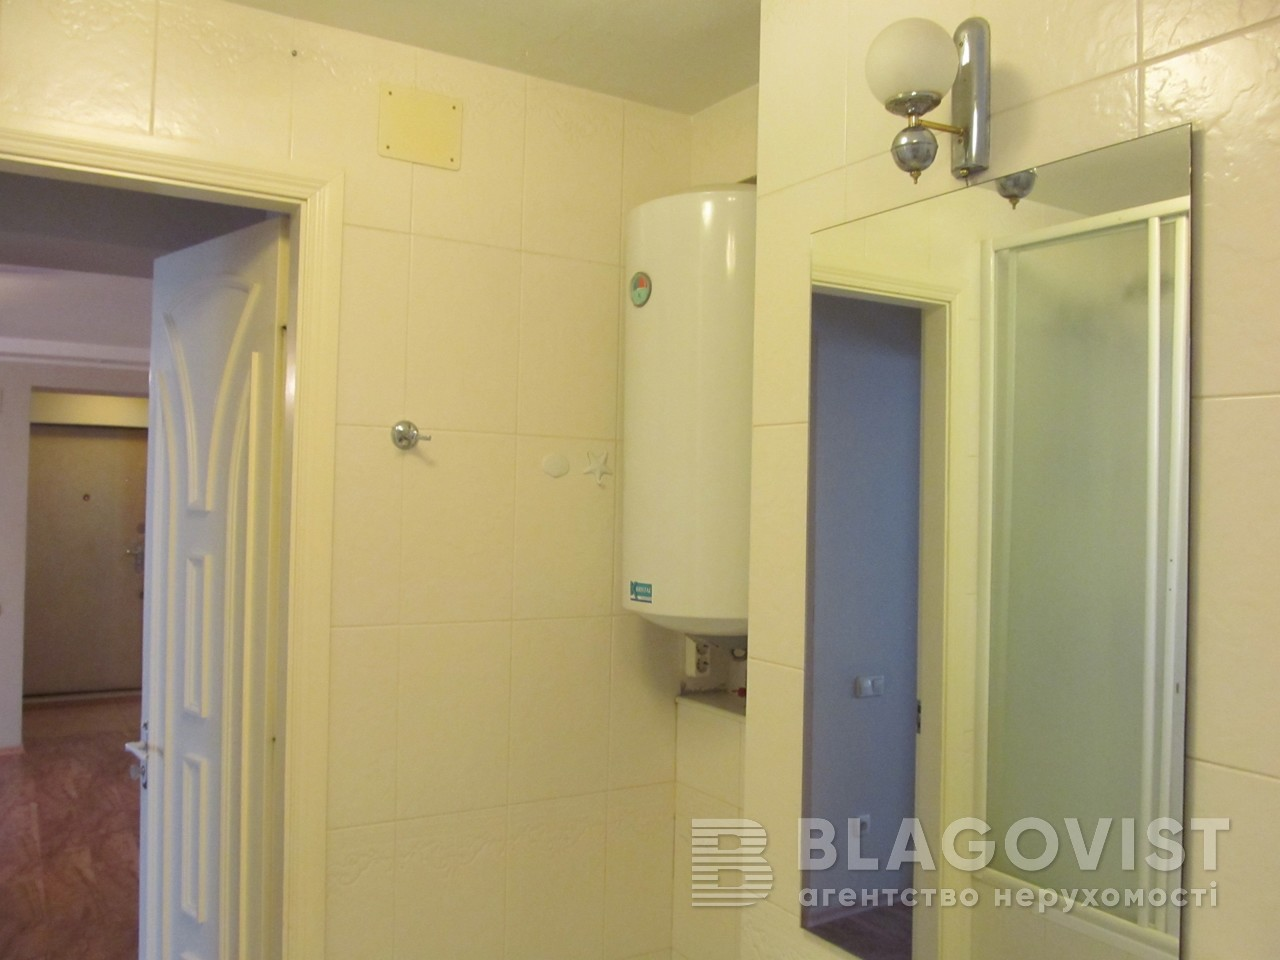 Квартира A-103899, Антоновича (Горького), 100, Киев - Фото 19